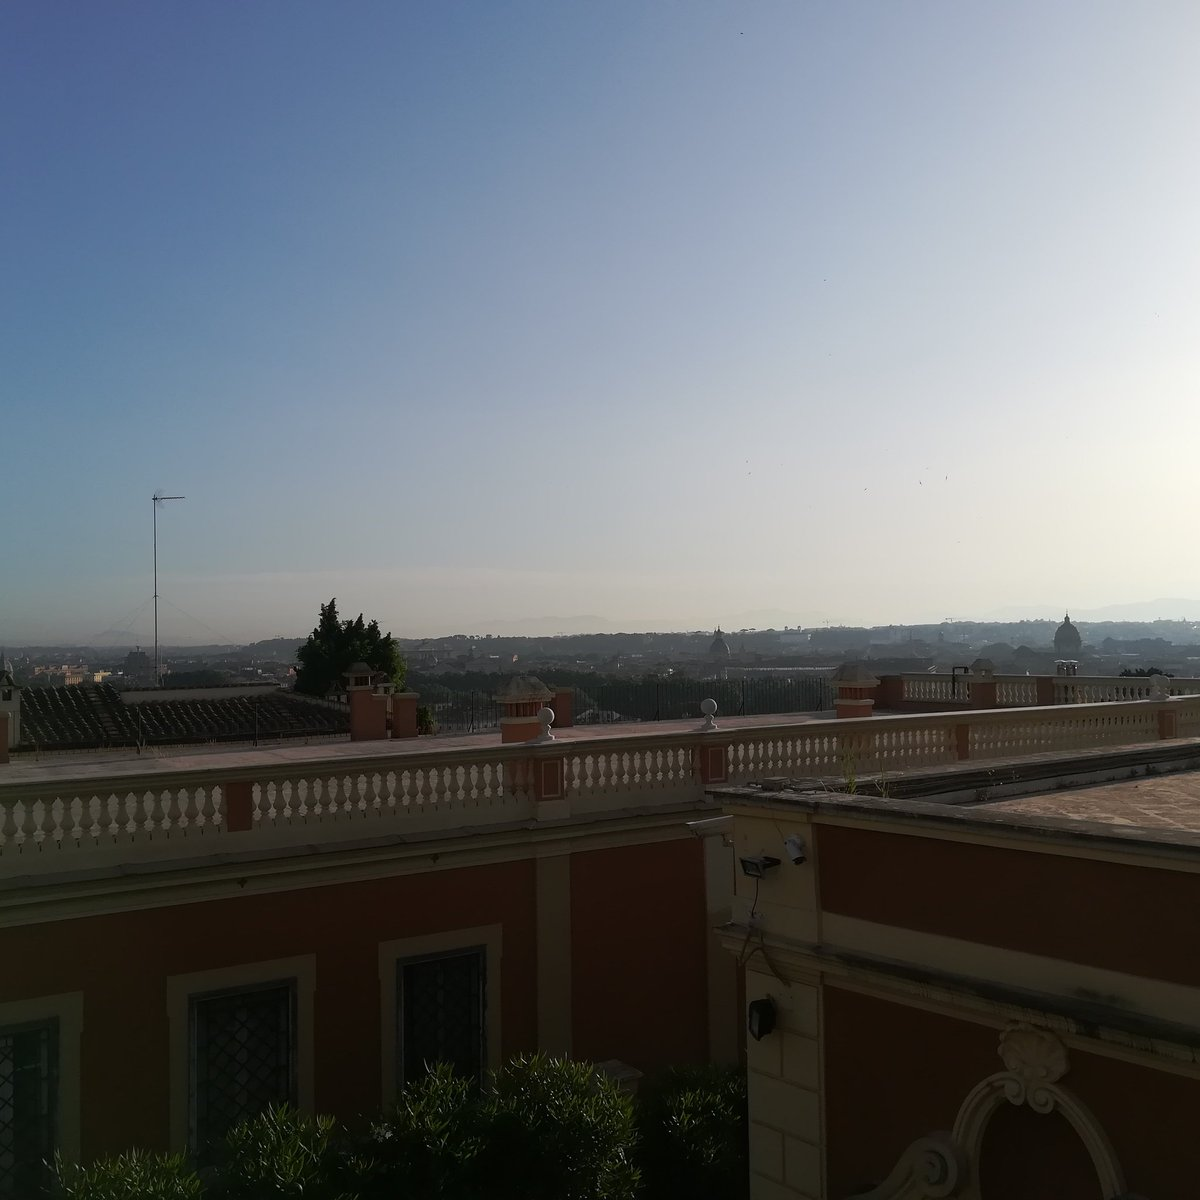 #Roma, con le sue sfumature subito dopo lalba, vista dal #Gianicolo. Impressionante... #romeisus #Rome #Gaudium @JPaul33267538 @Turismoromaweb @caputmundiHeidi @Roma__Go @VeniVidiVisit